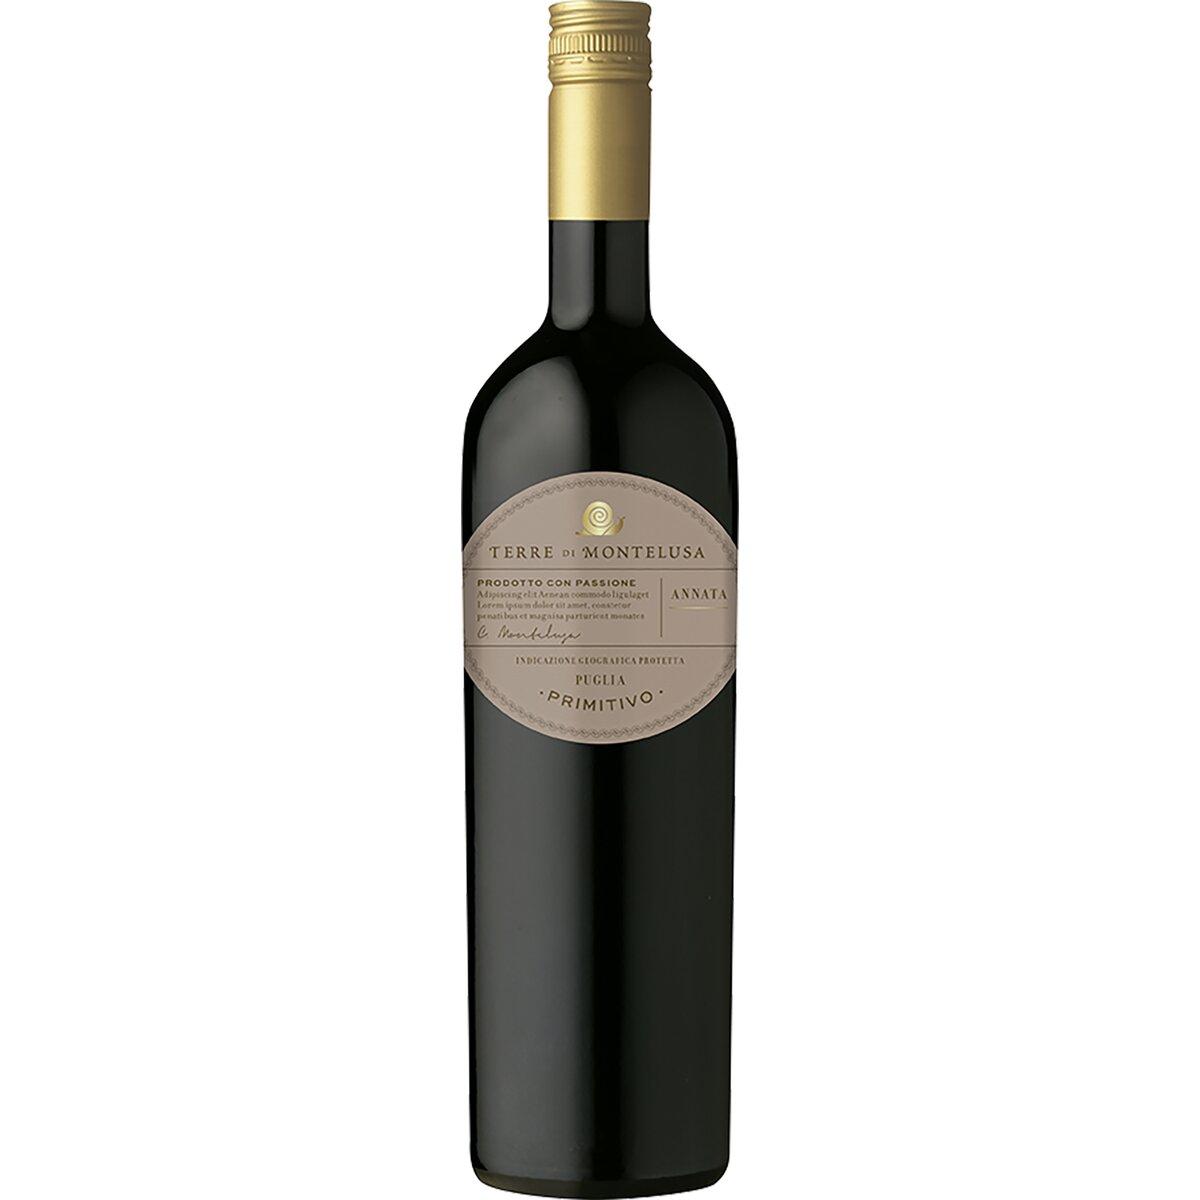 Terre di Montelusa Primitivo IGT Puglia - Botter Wines - , , , ,